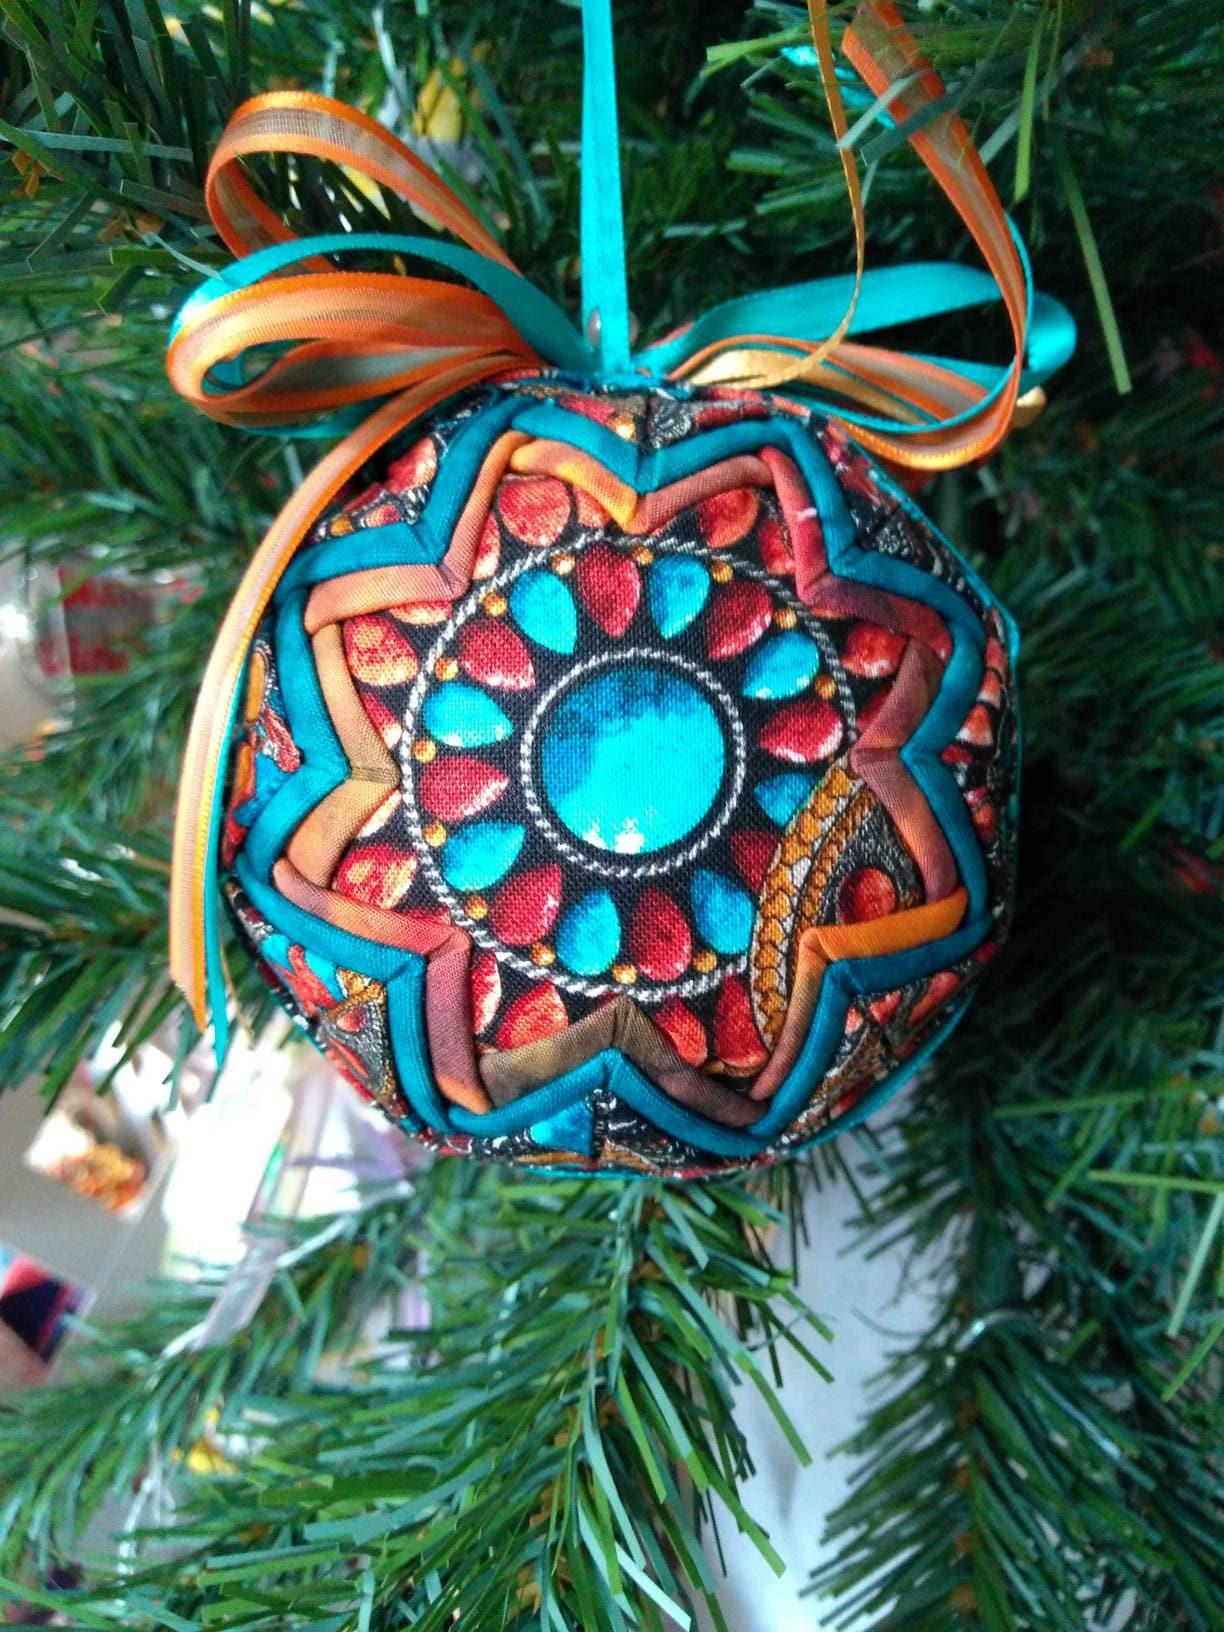 No Sew OrnamentFolded Fabric Ornament Southwest theme | Etsy